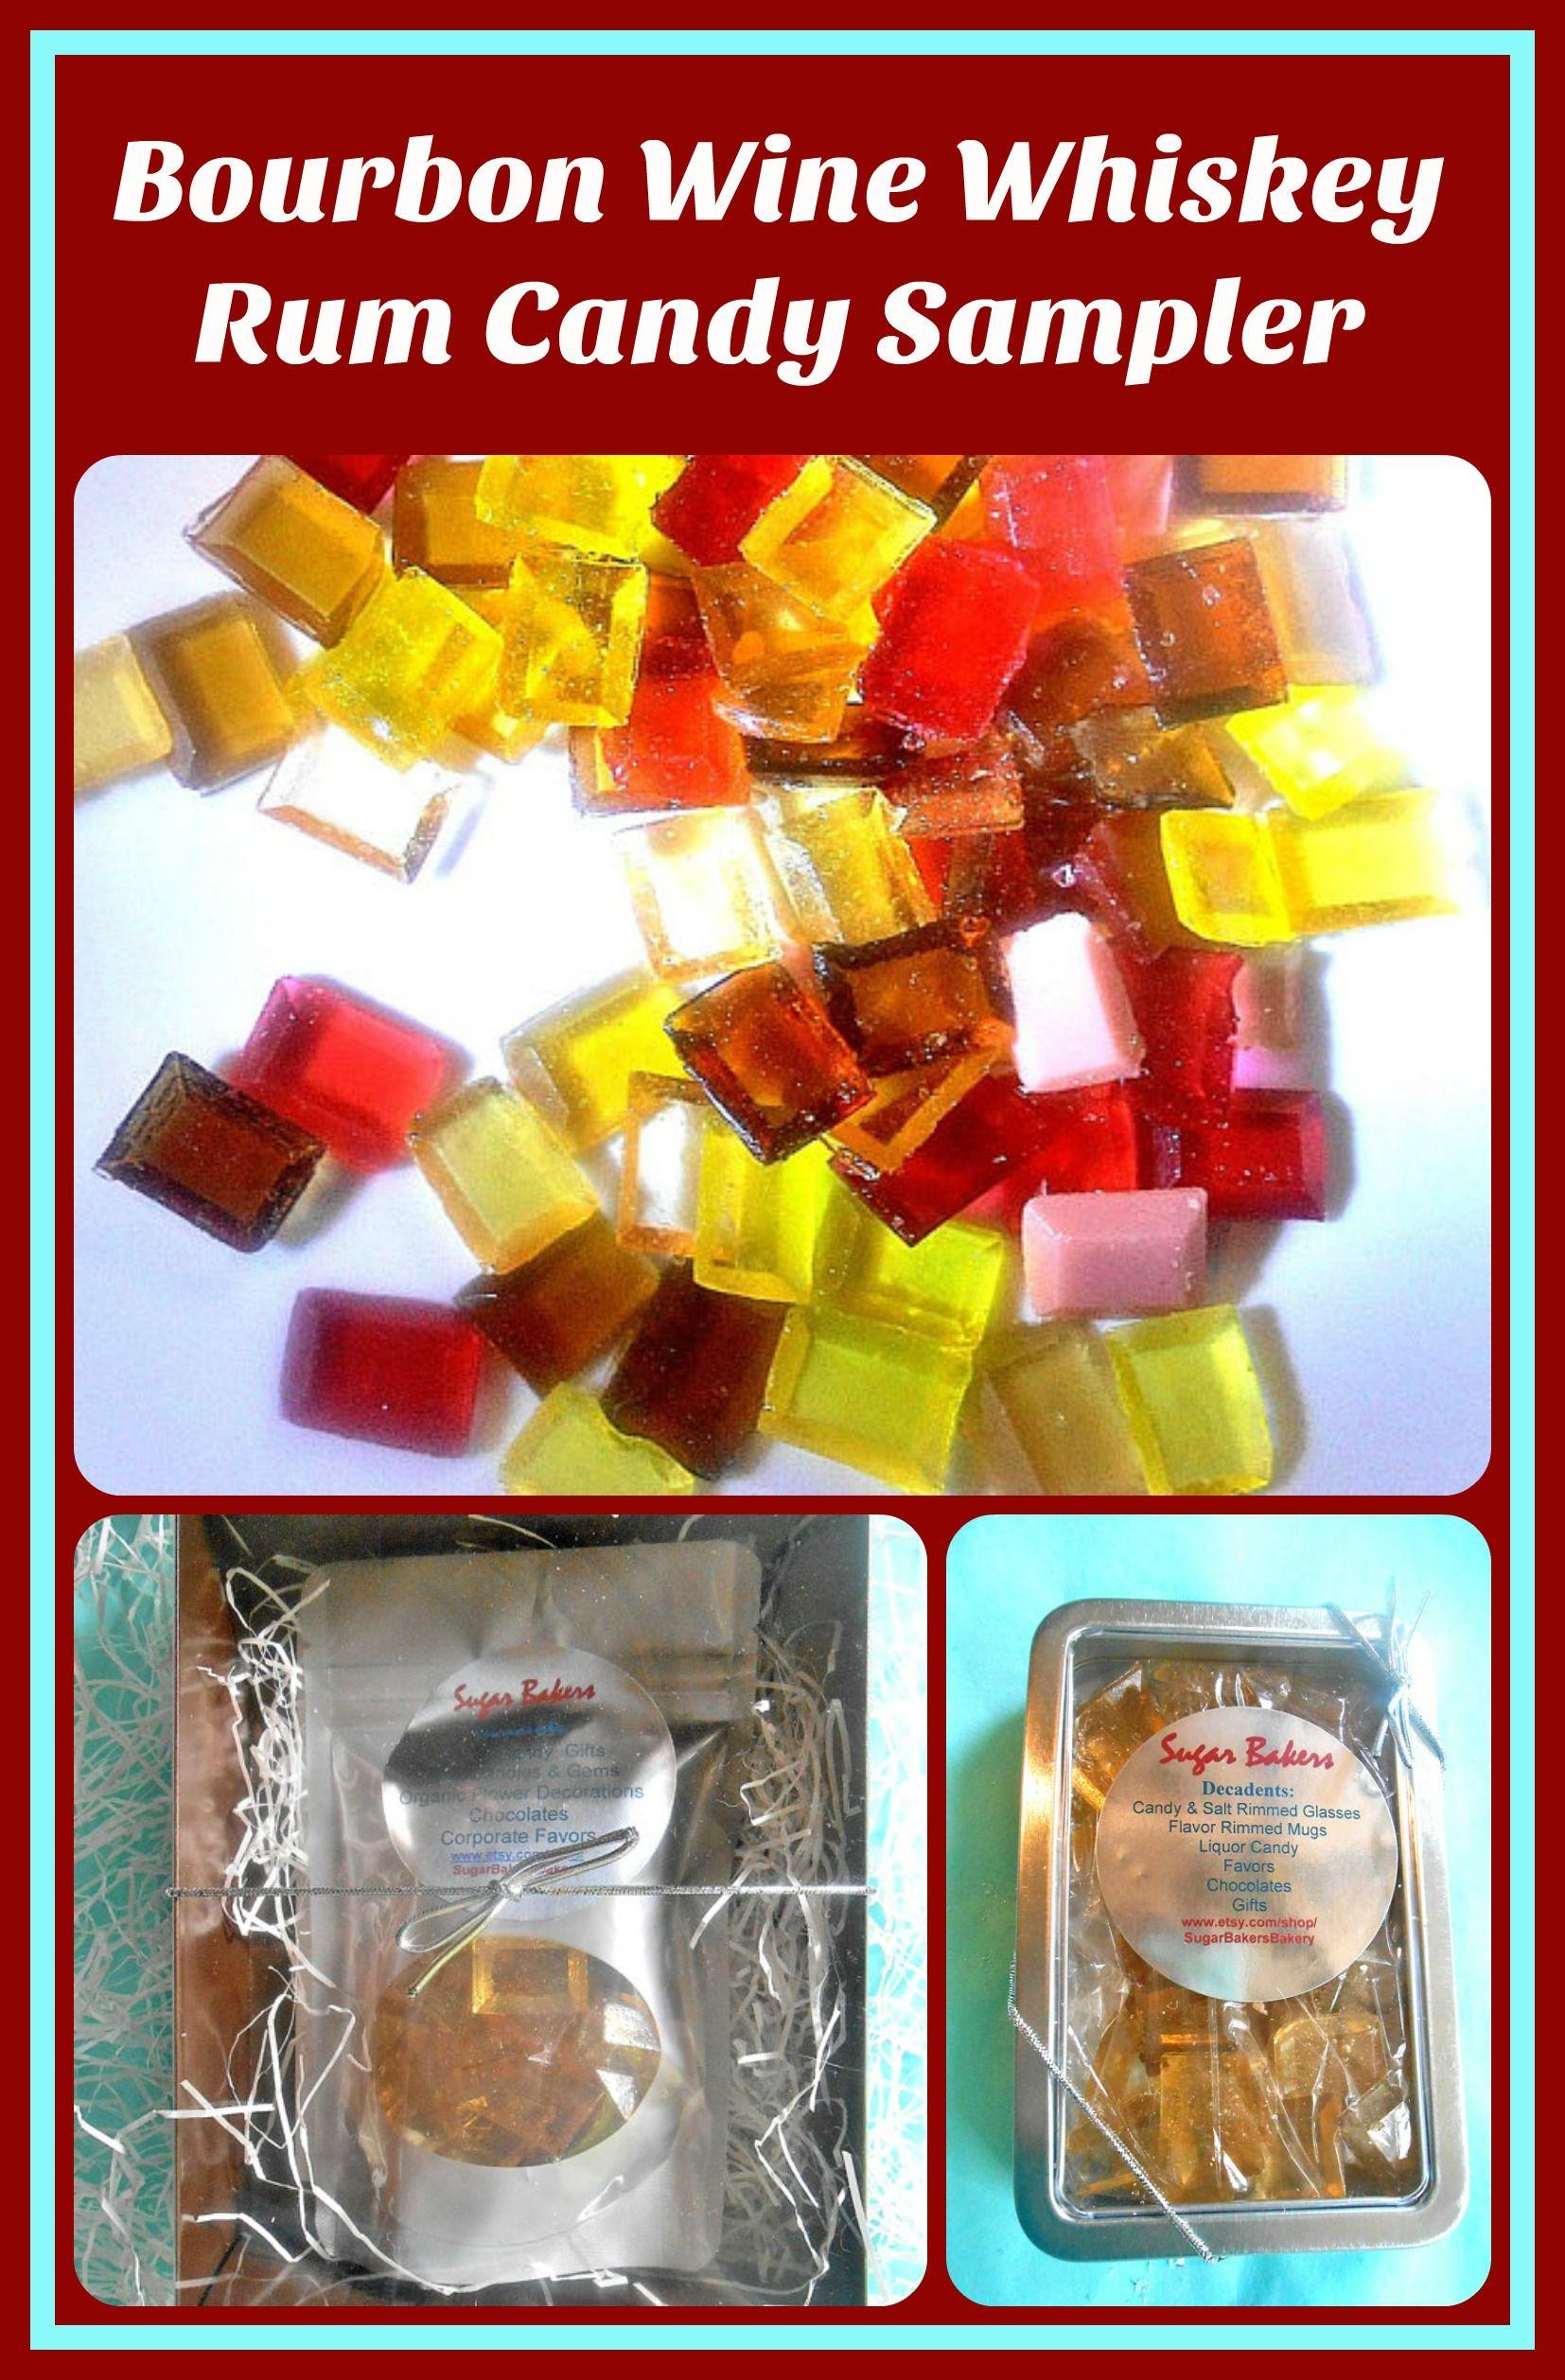 Gift boxed sampler bourbon wine whiskey rum candy